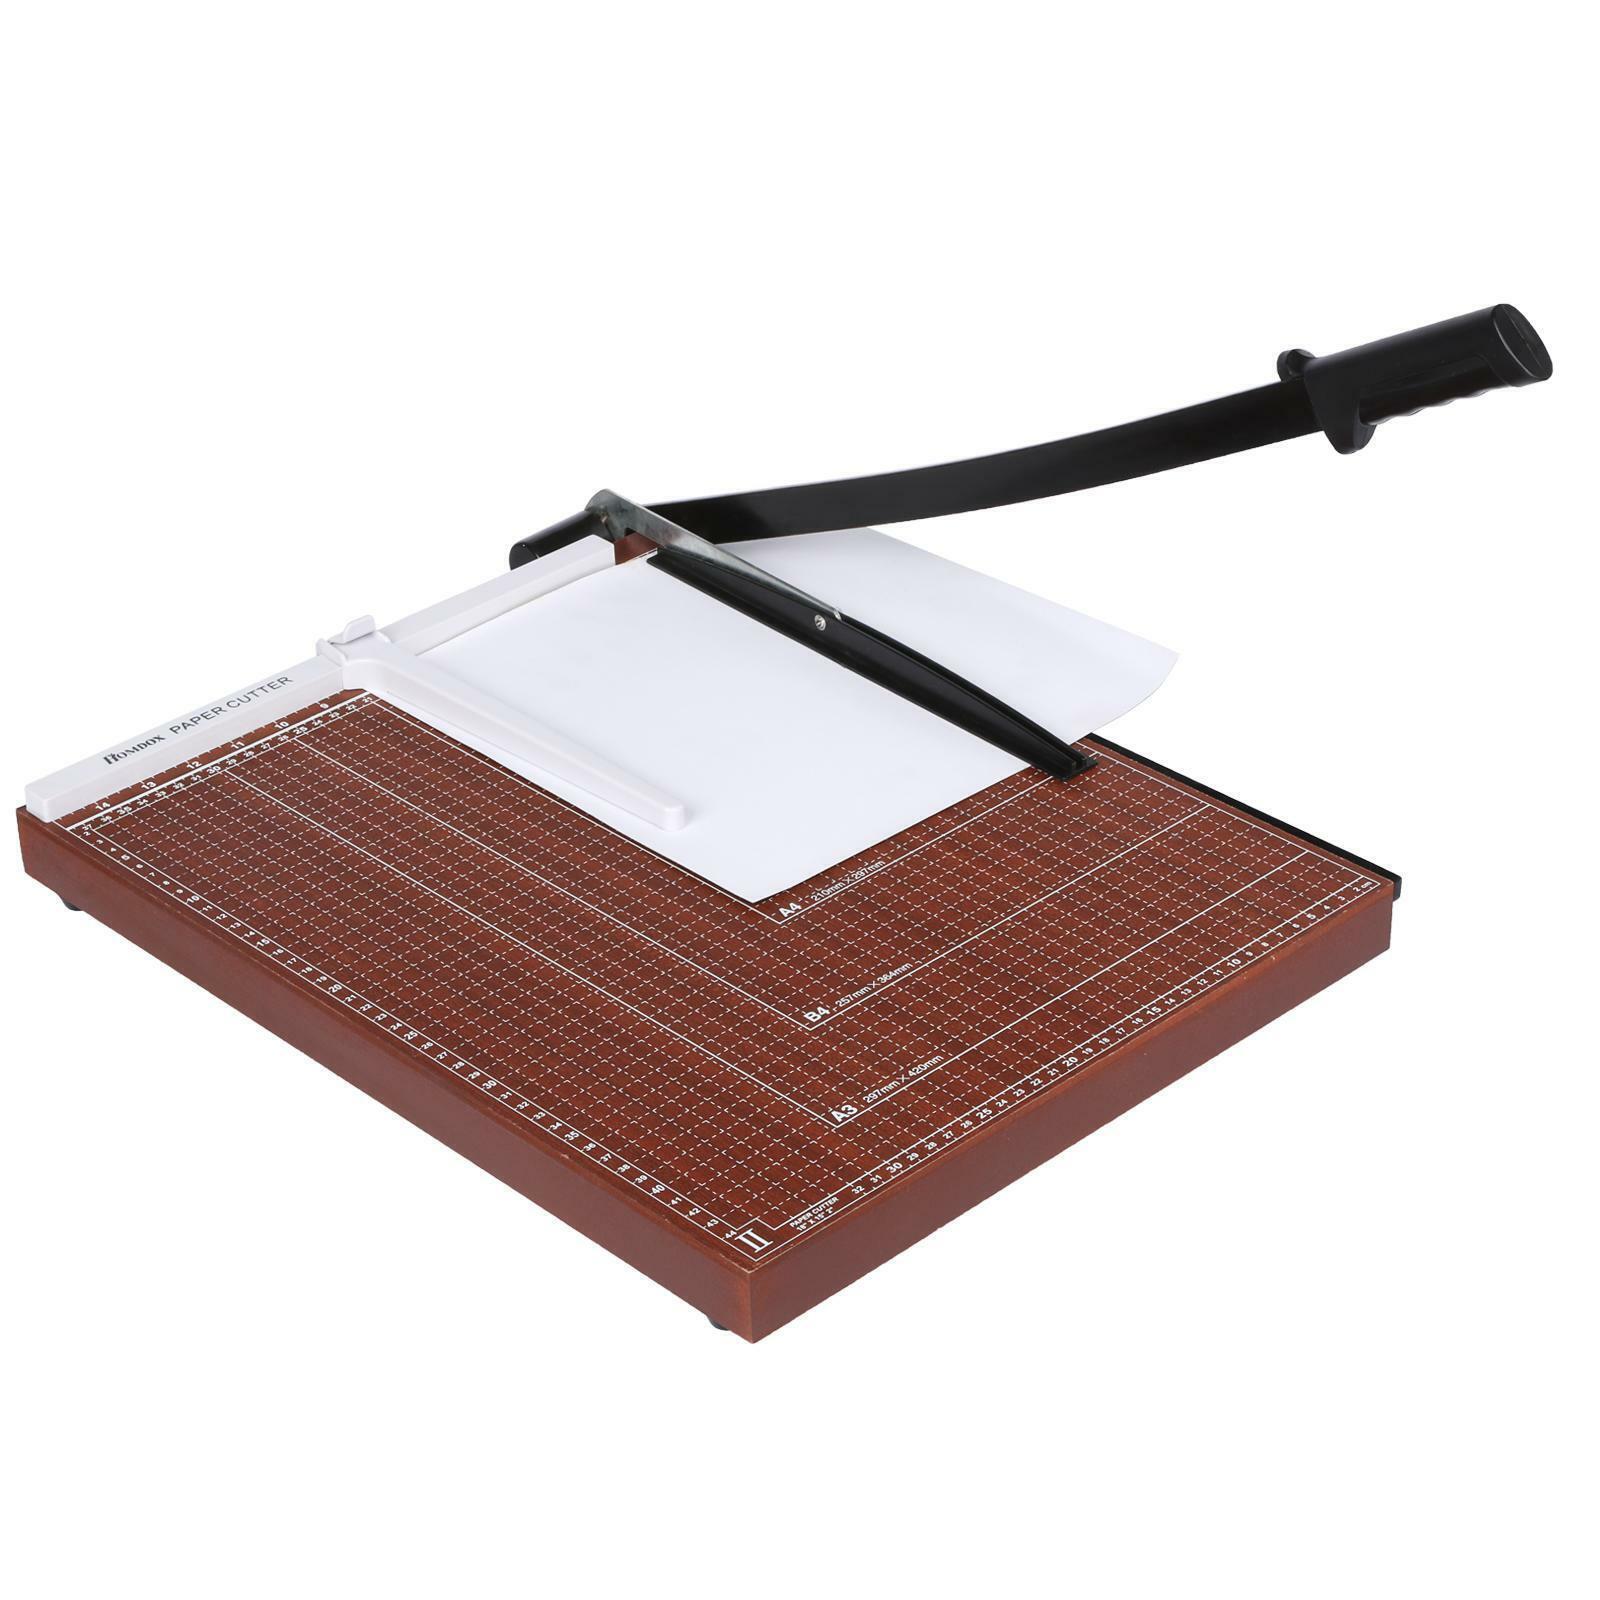 25Inch A4 to B7 Heavy Duty Guillotine Paper Cutter Photo Tri